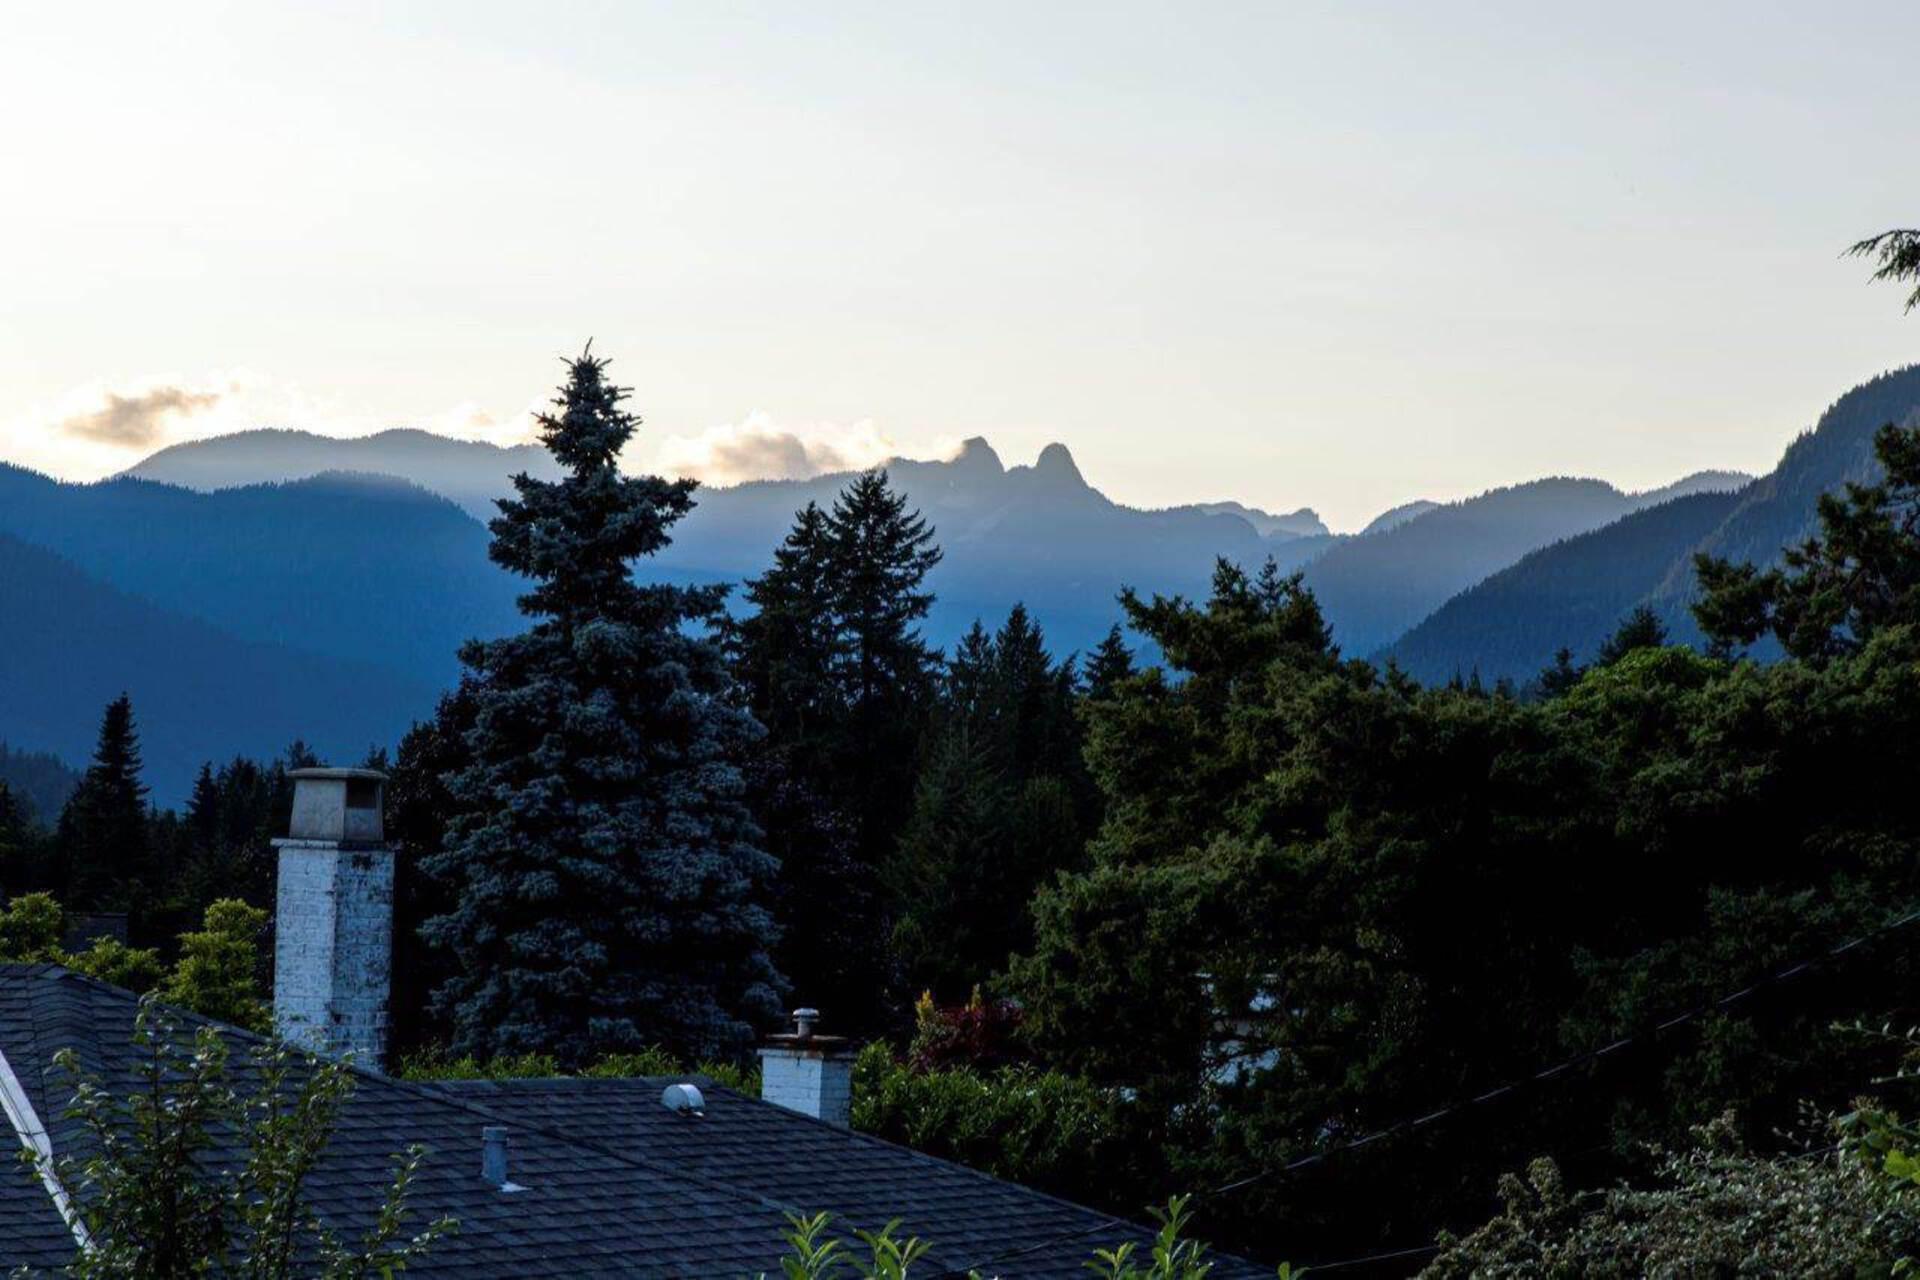 4367-ranger-avenue-forest-hills-nv-north-vancouver-30 at 4367 Ranger Avenue, Forest Hills NV, North Vancouver